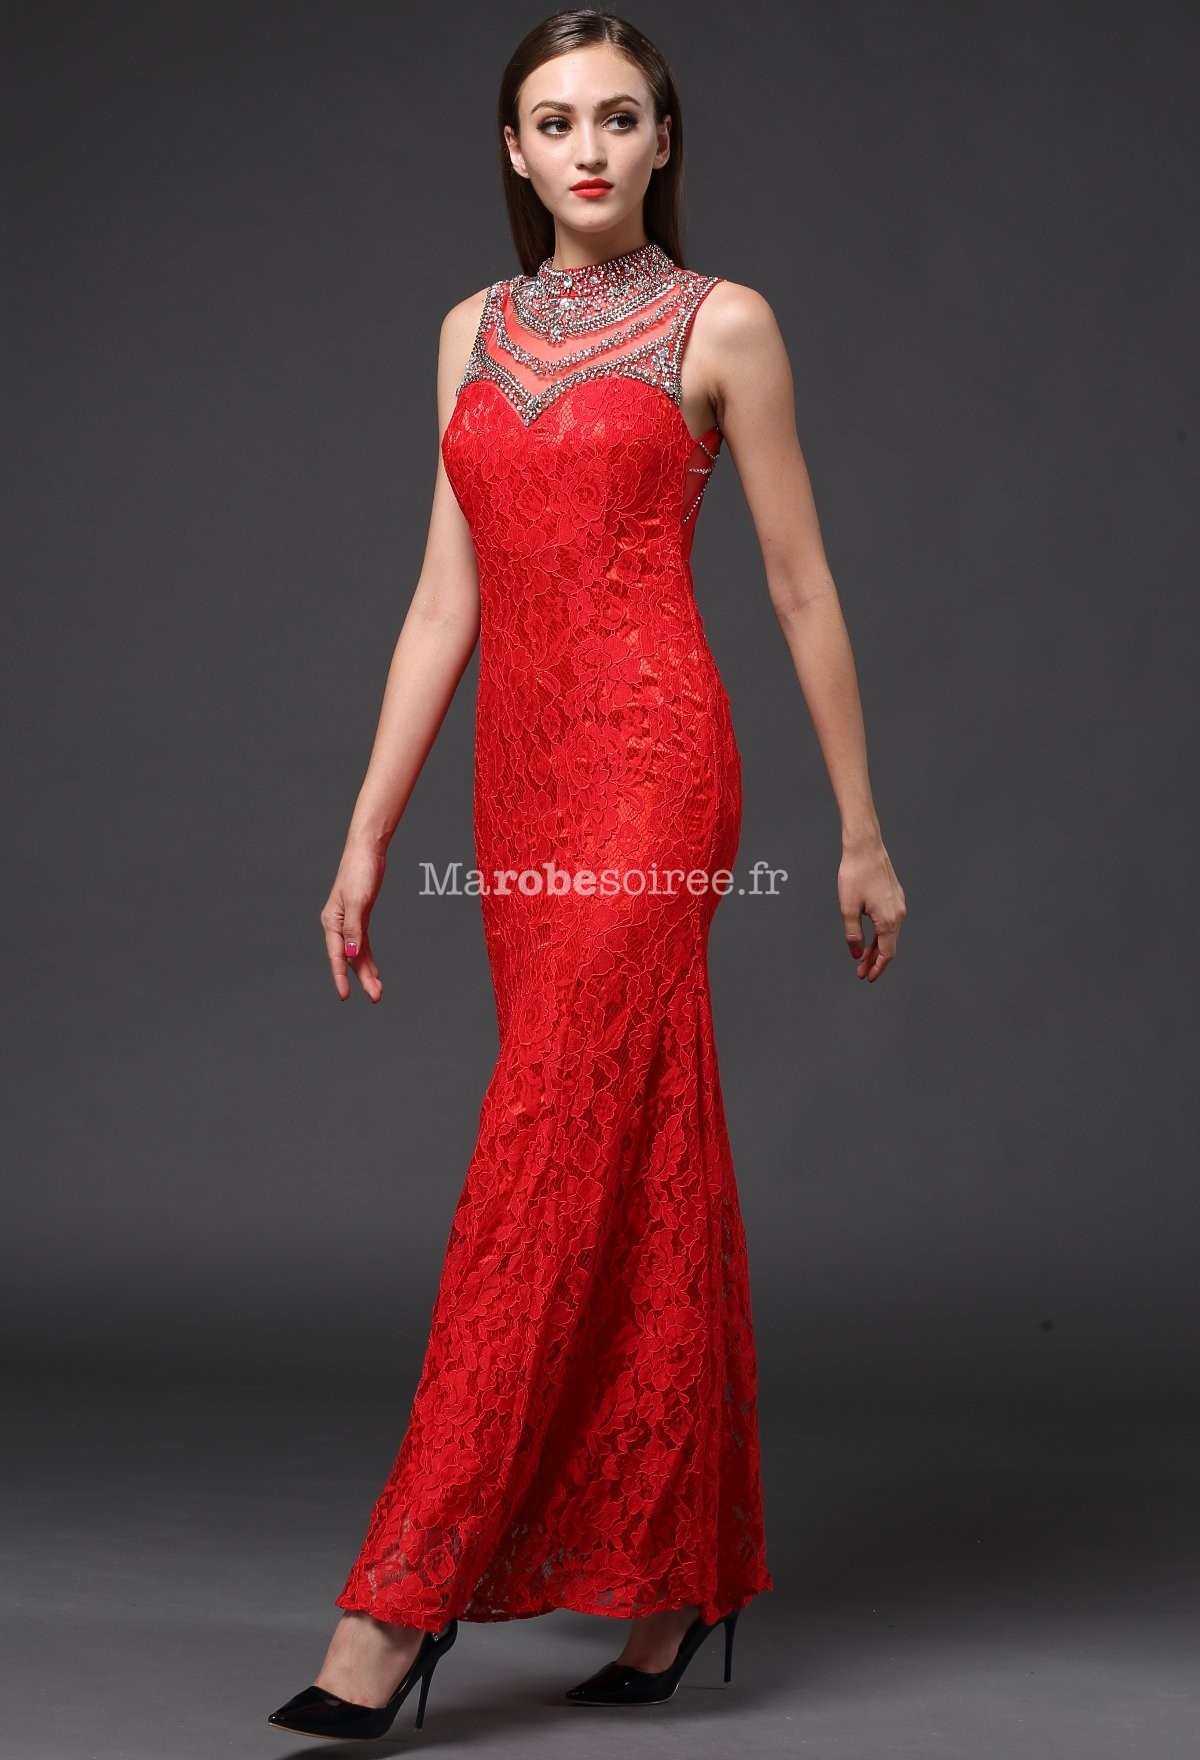 robe de soir e longue rouge dentelle. Black Bedroom Furniture Sets. Home Design Ideas